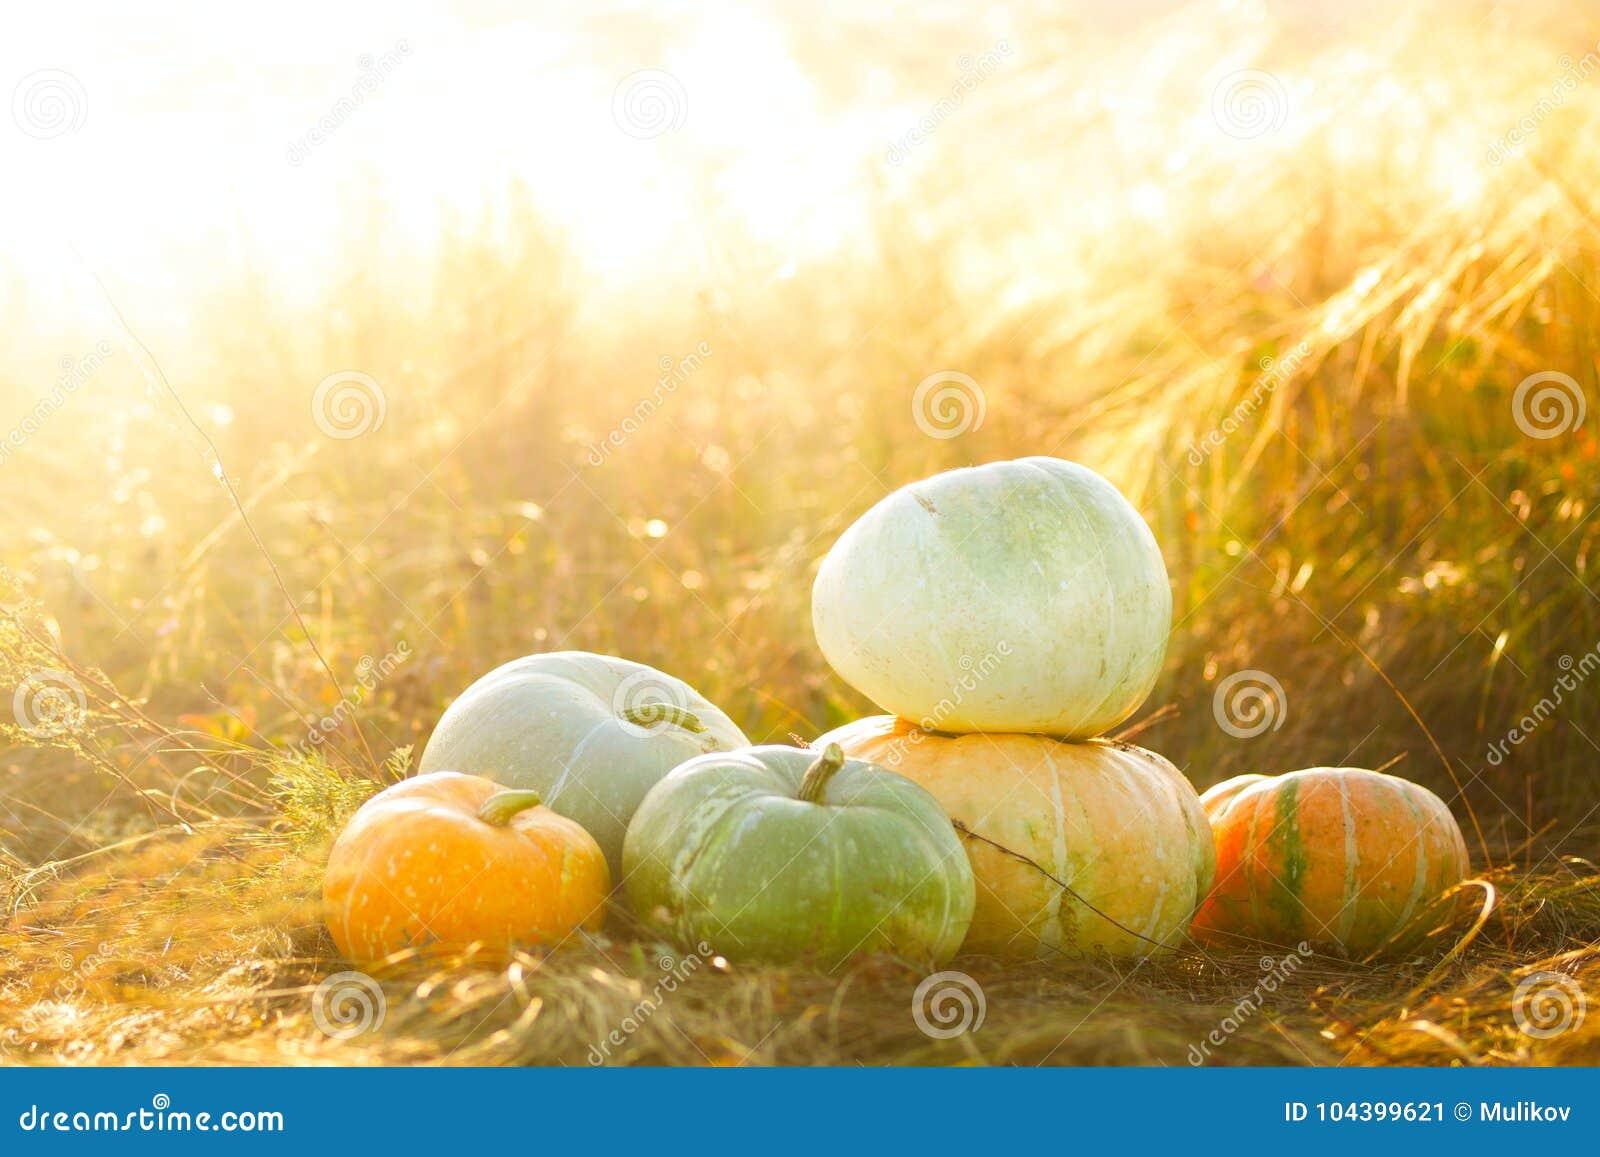 Pompoenen openlucht Pompoen op droog de herfst geel gras over zonsondergang of zonsopgang sunbeam